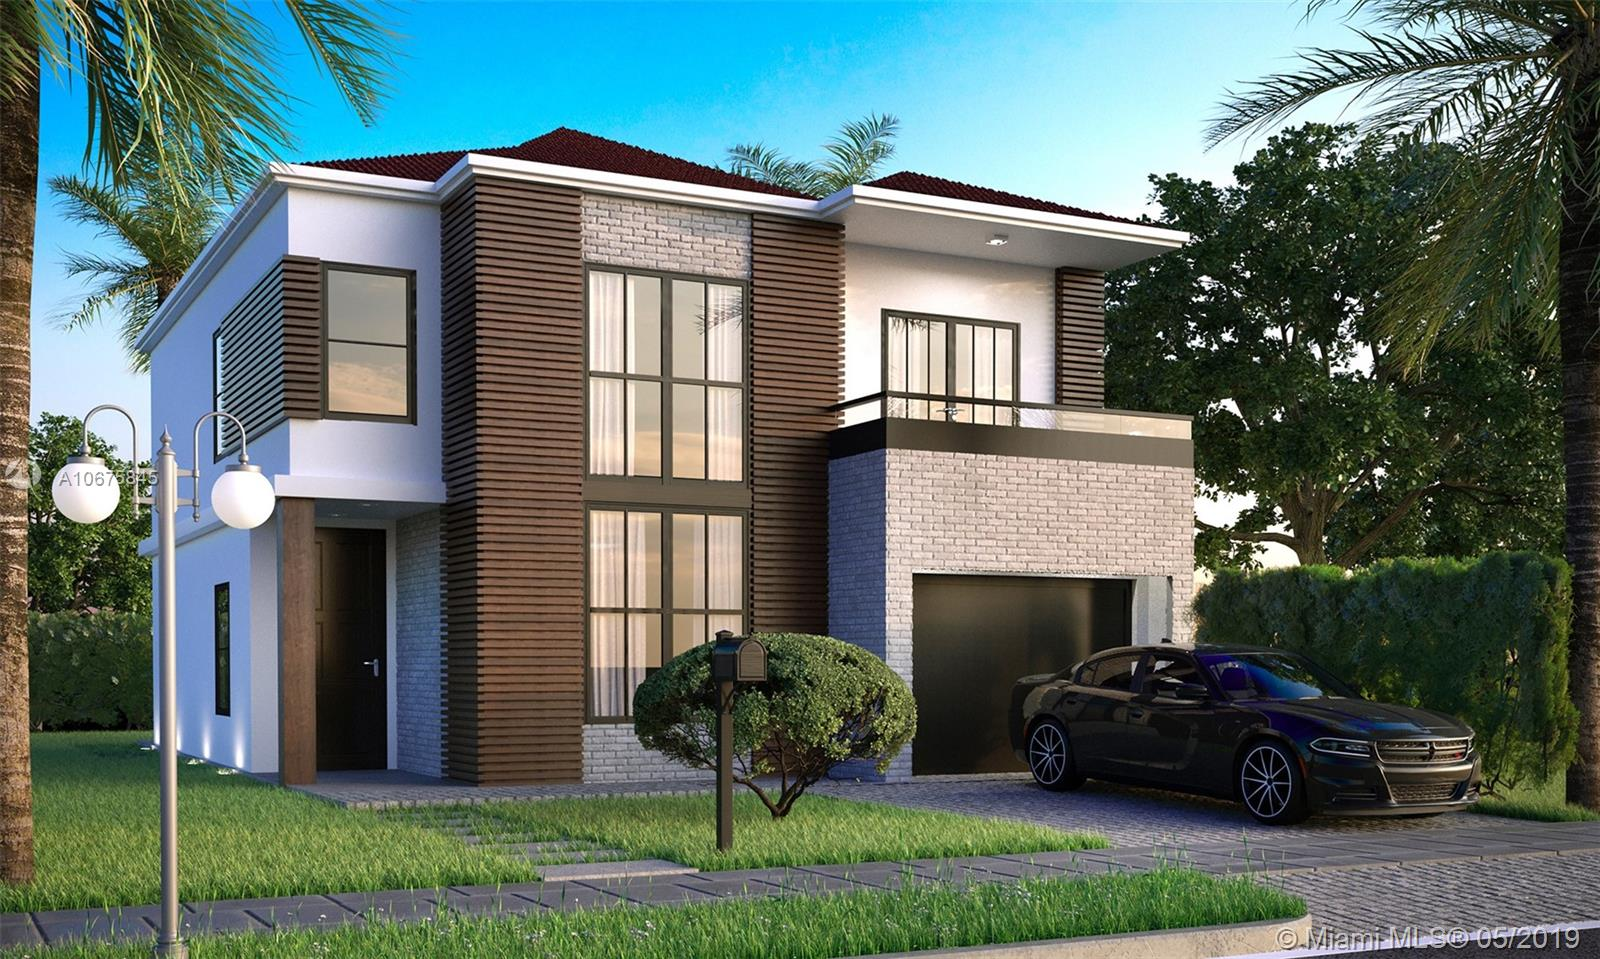 1101 Palm Dr, Florida City, FL 33034 - Florida City, FL real estate listing